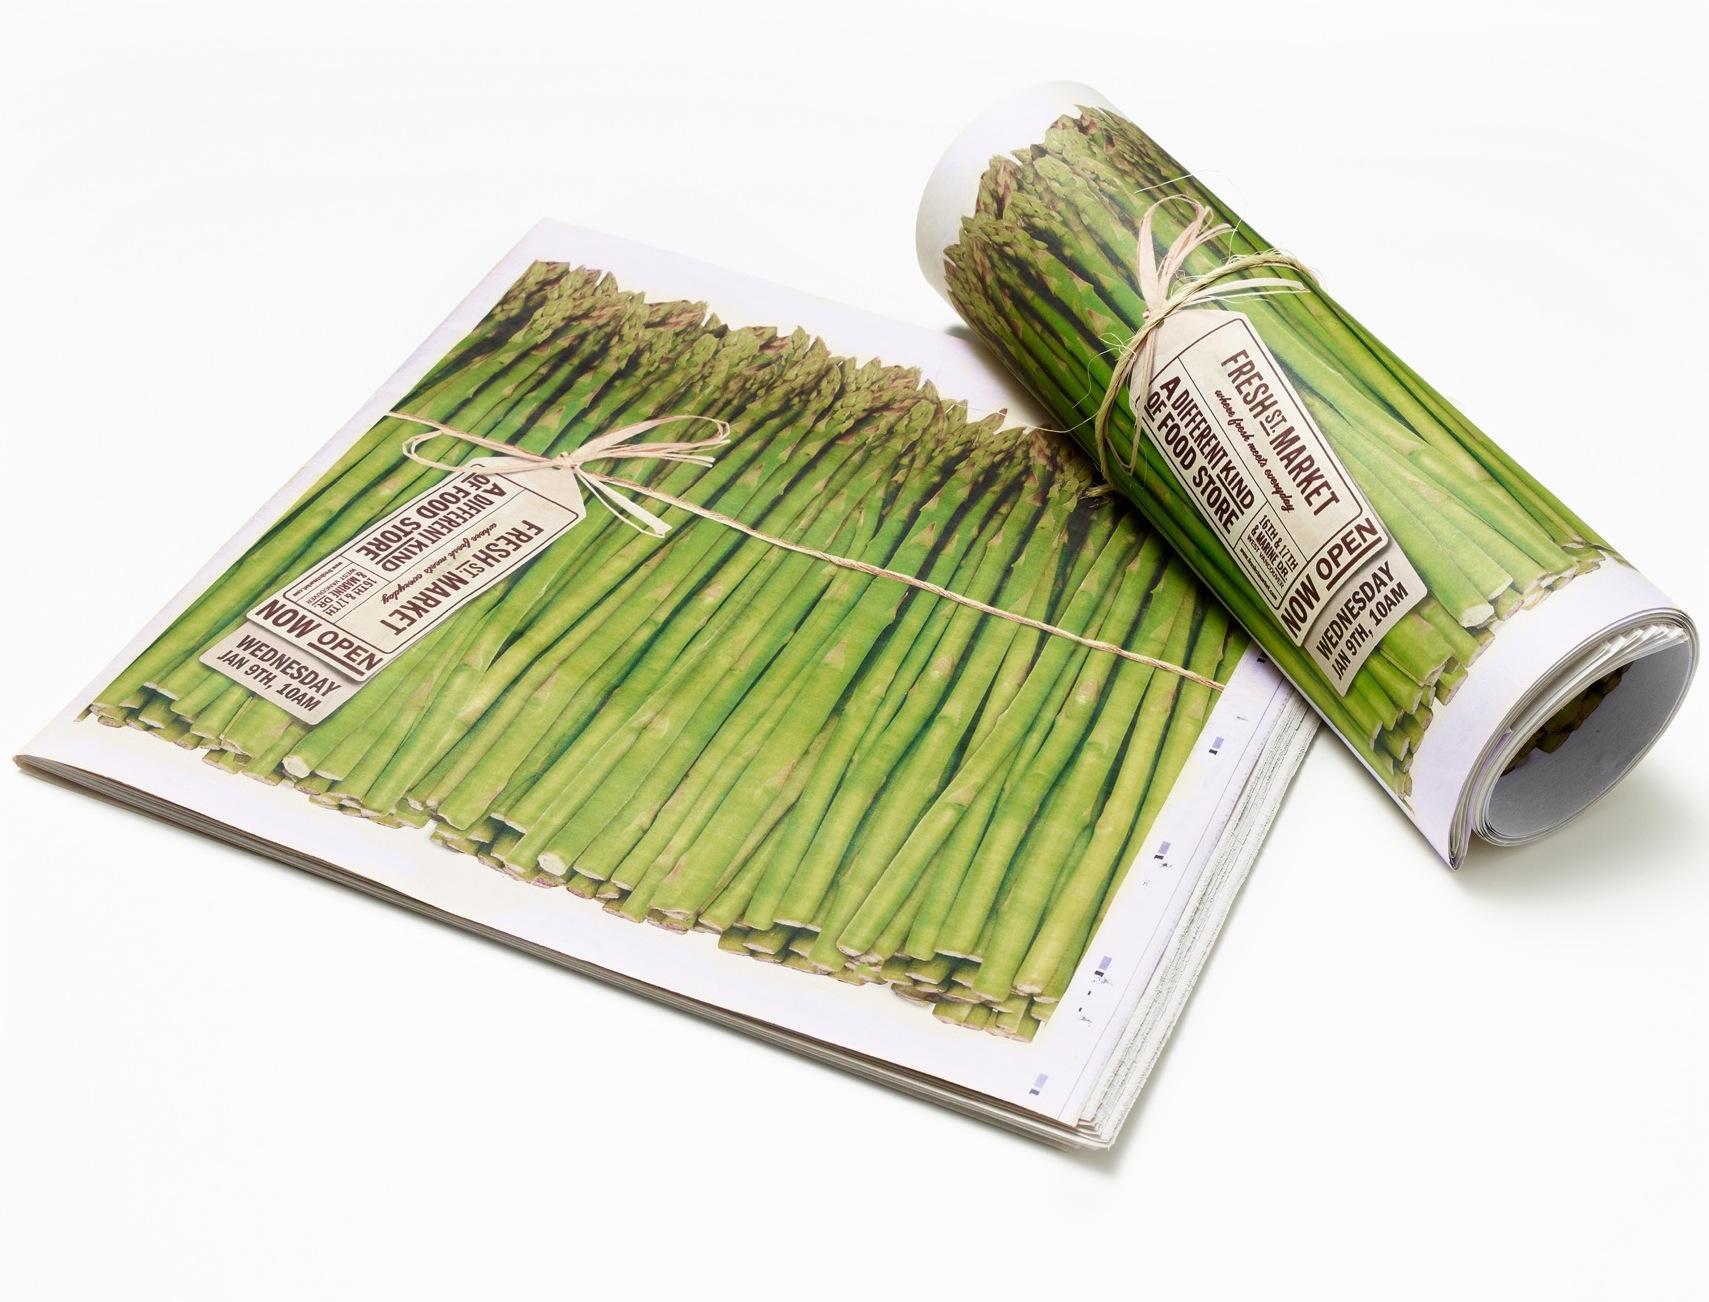 Fresh St. Market Print Ad -  Fresh St. Asparagus Wrap